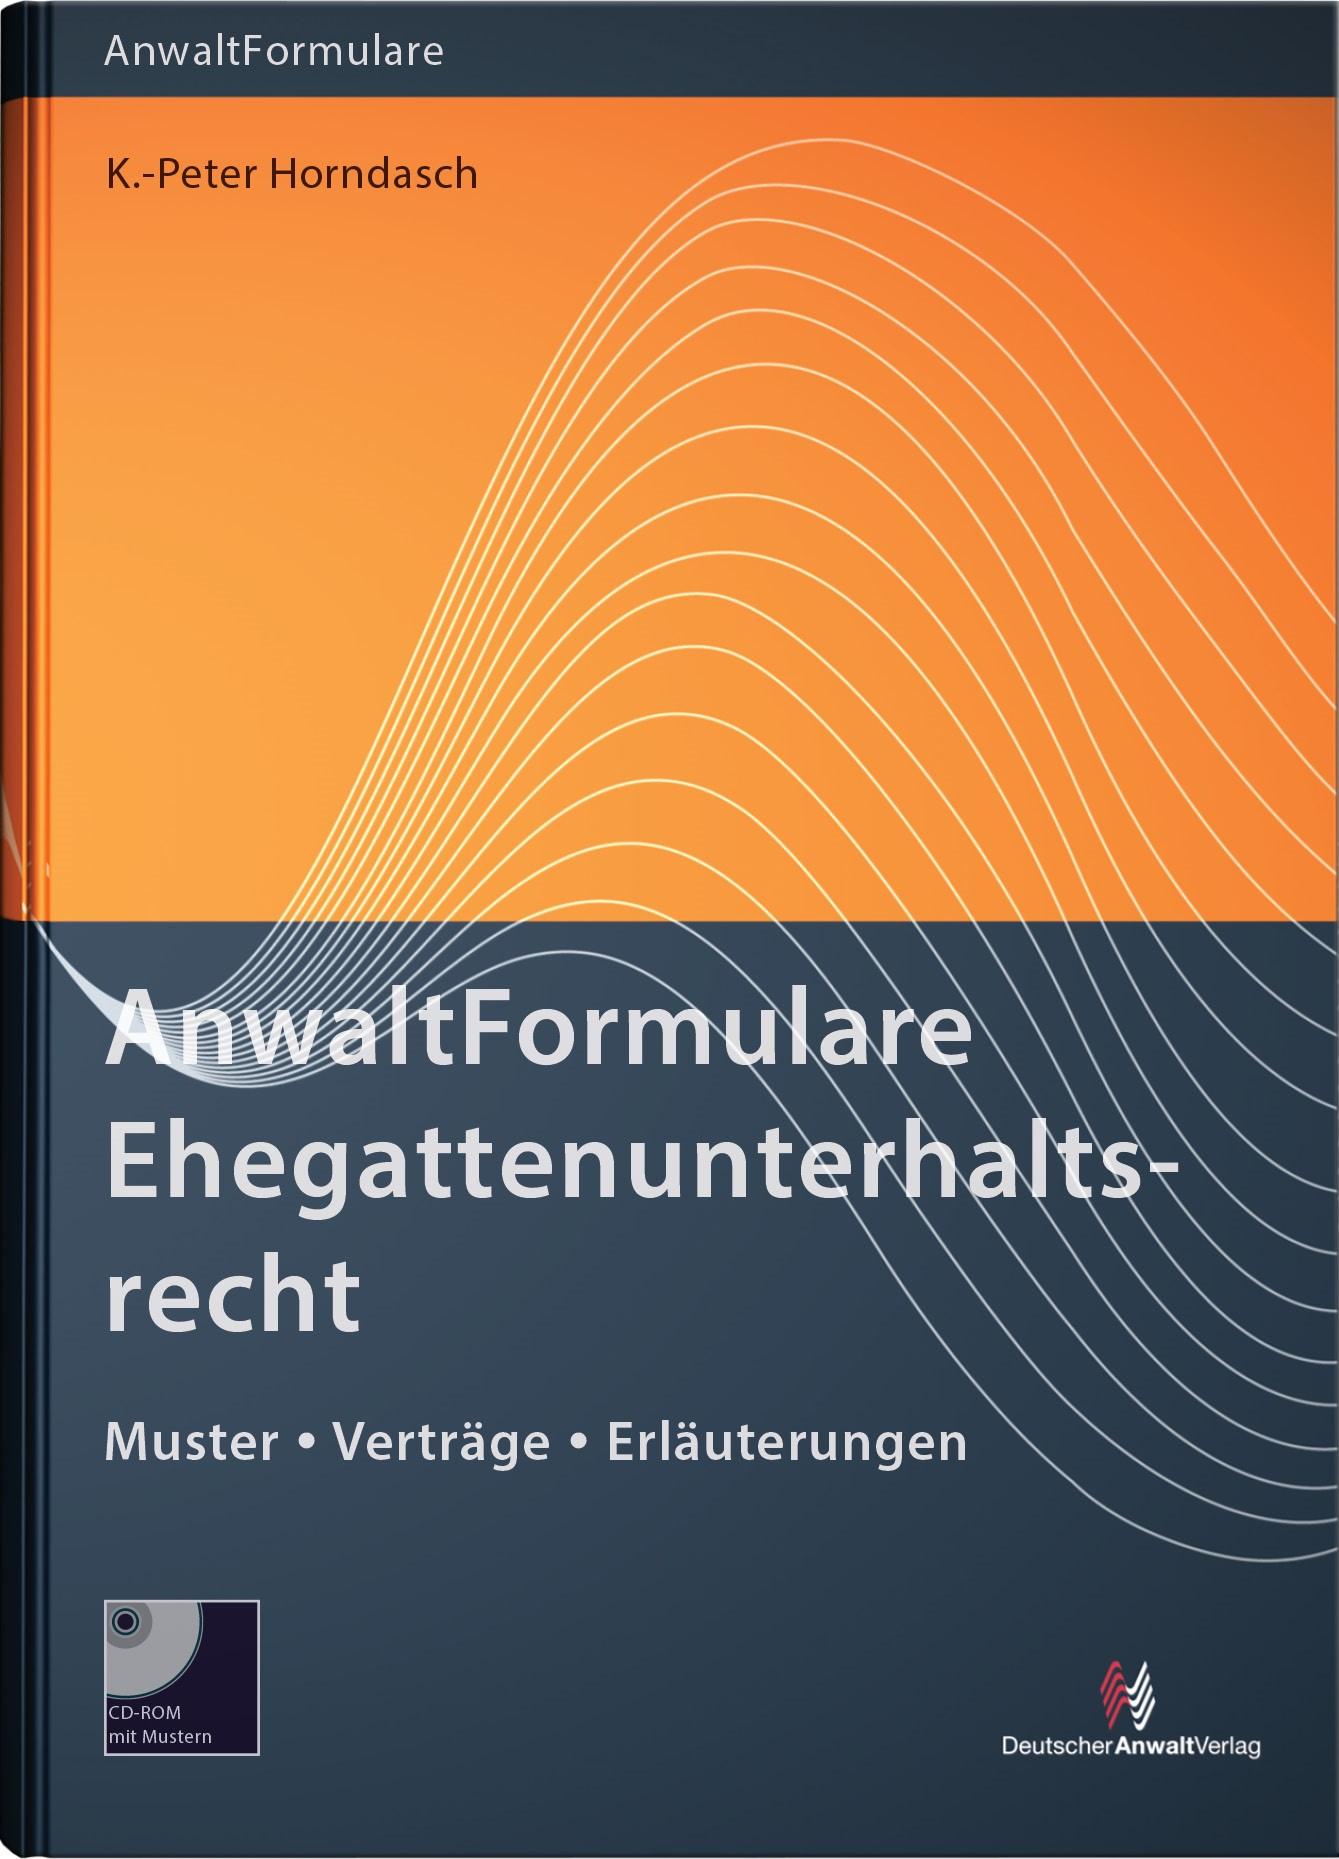 AnwaltFormulare Ehegattenunterhaltsrecht | Horndasch, 2015 | Buch (Cover)